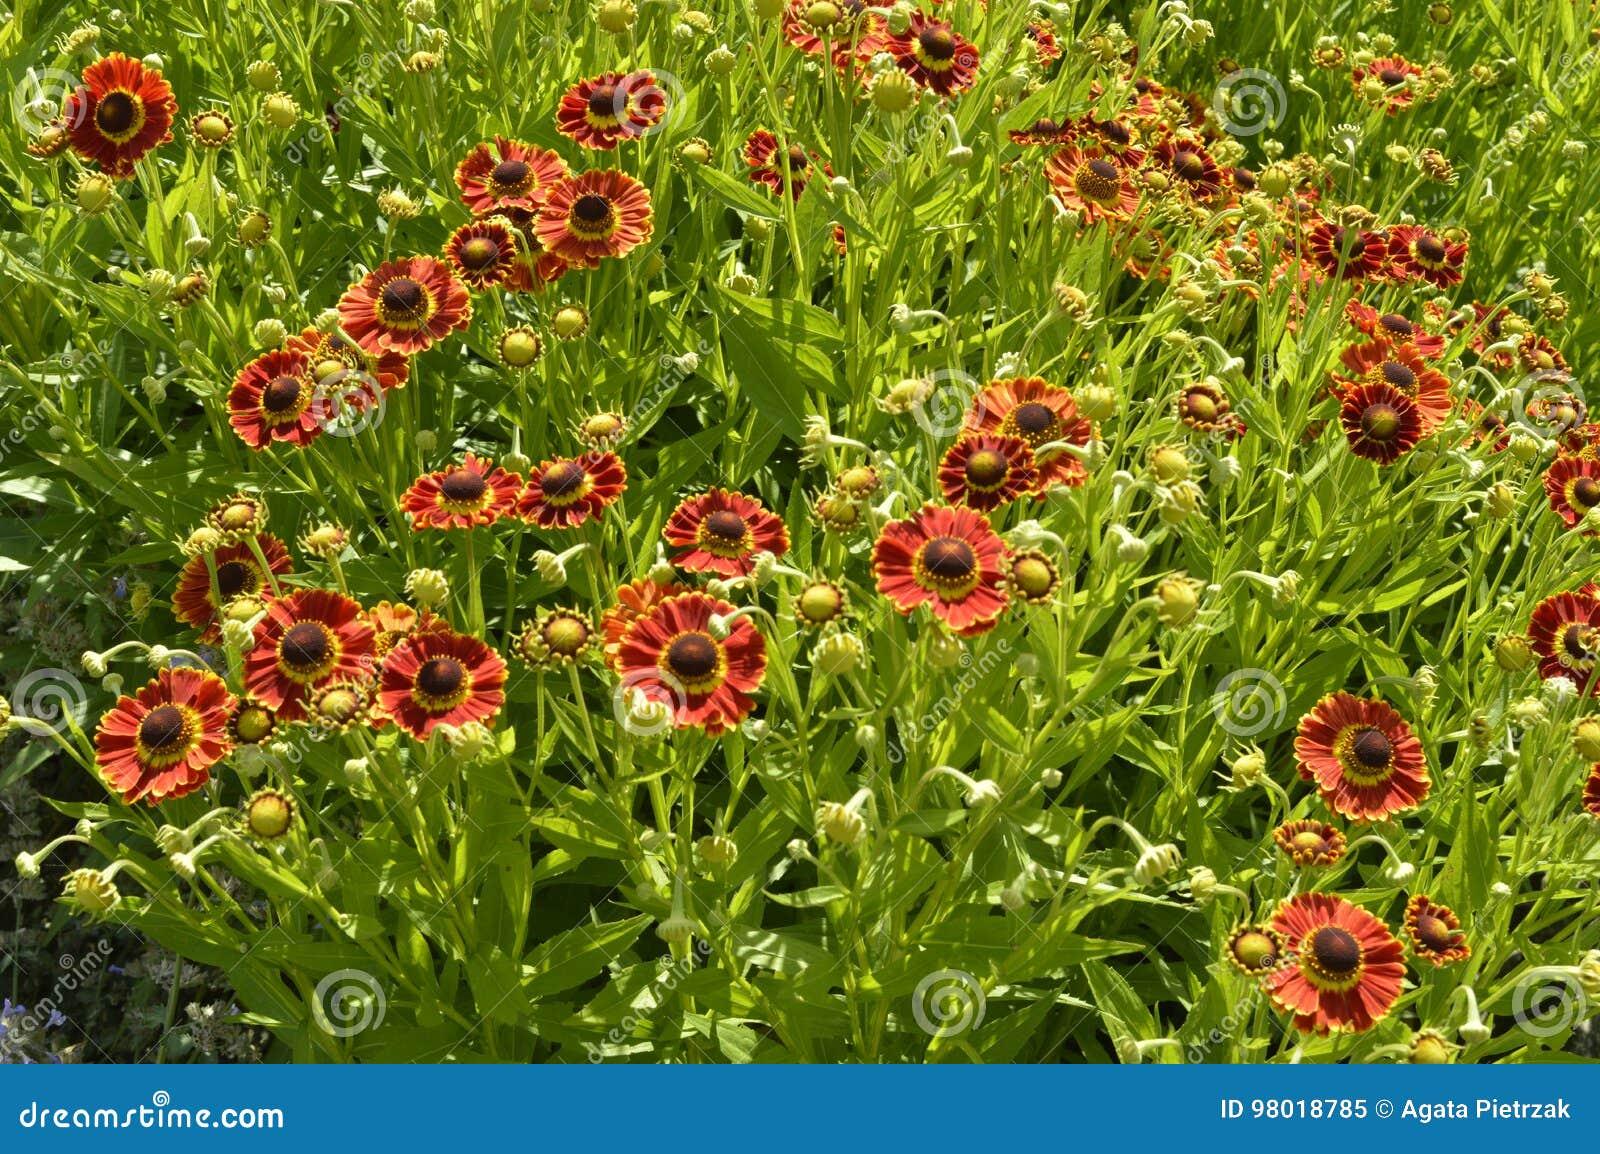 Orange and red daisies stock image image of daisy coneflower beautiful tall flowers like orange and red daisies izmirmasajfo